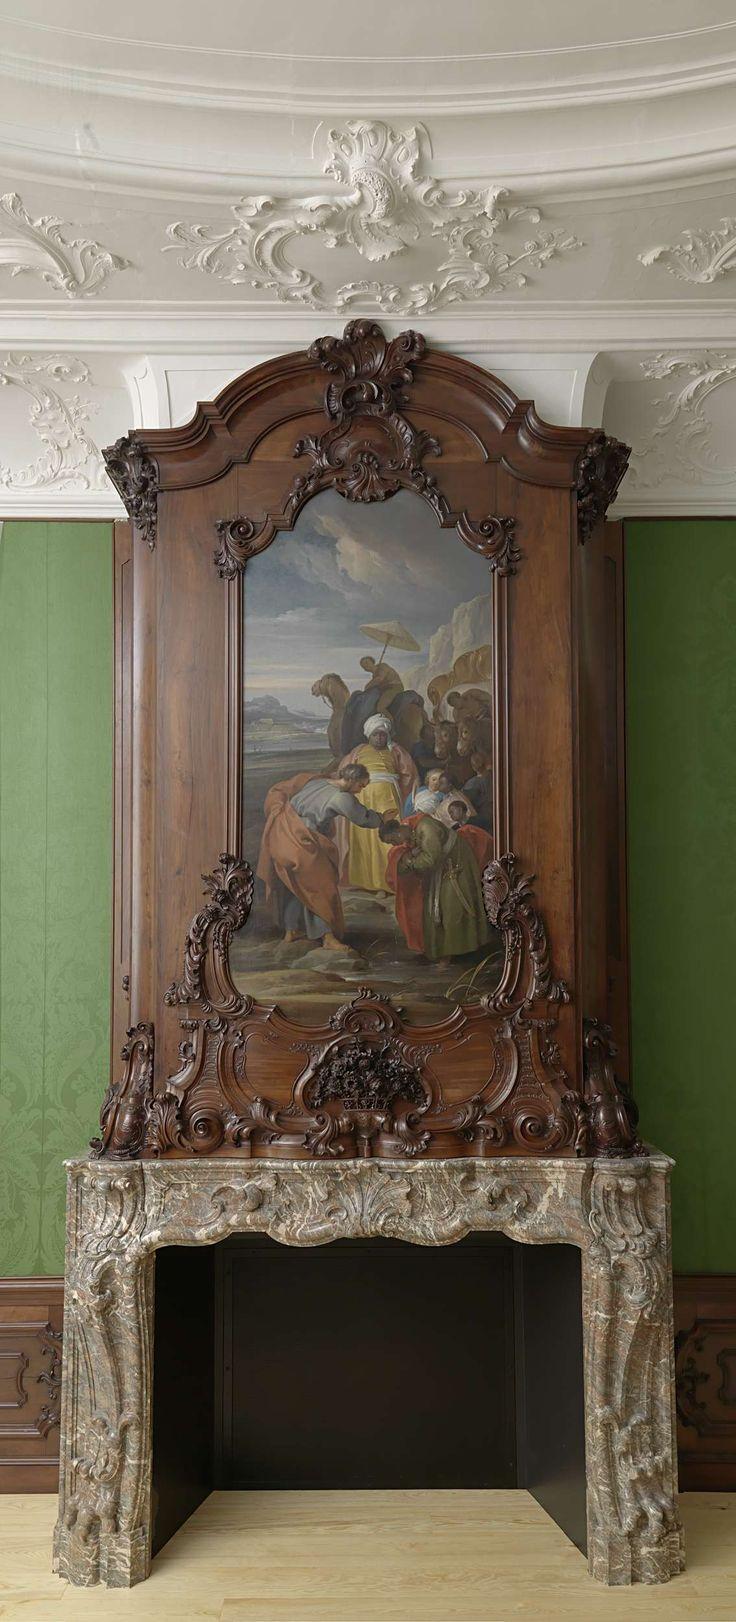 Amsterdamse grachtenkamer 1748, anoniem, ca. 1745 - ca. 1748